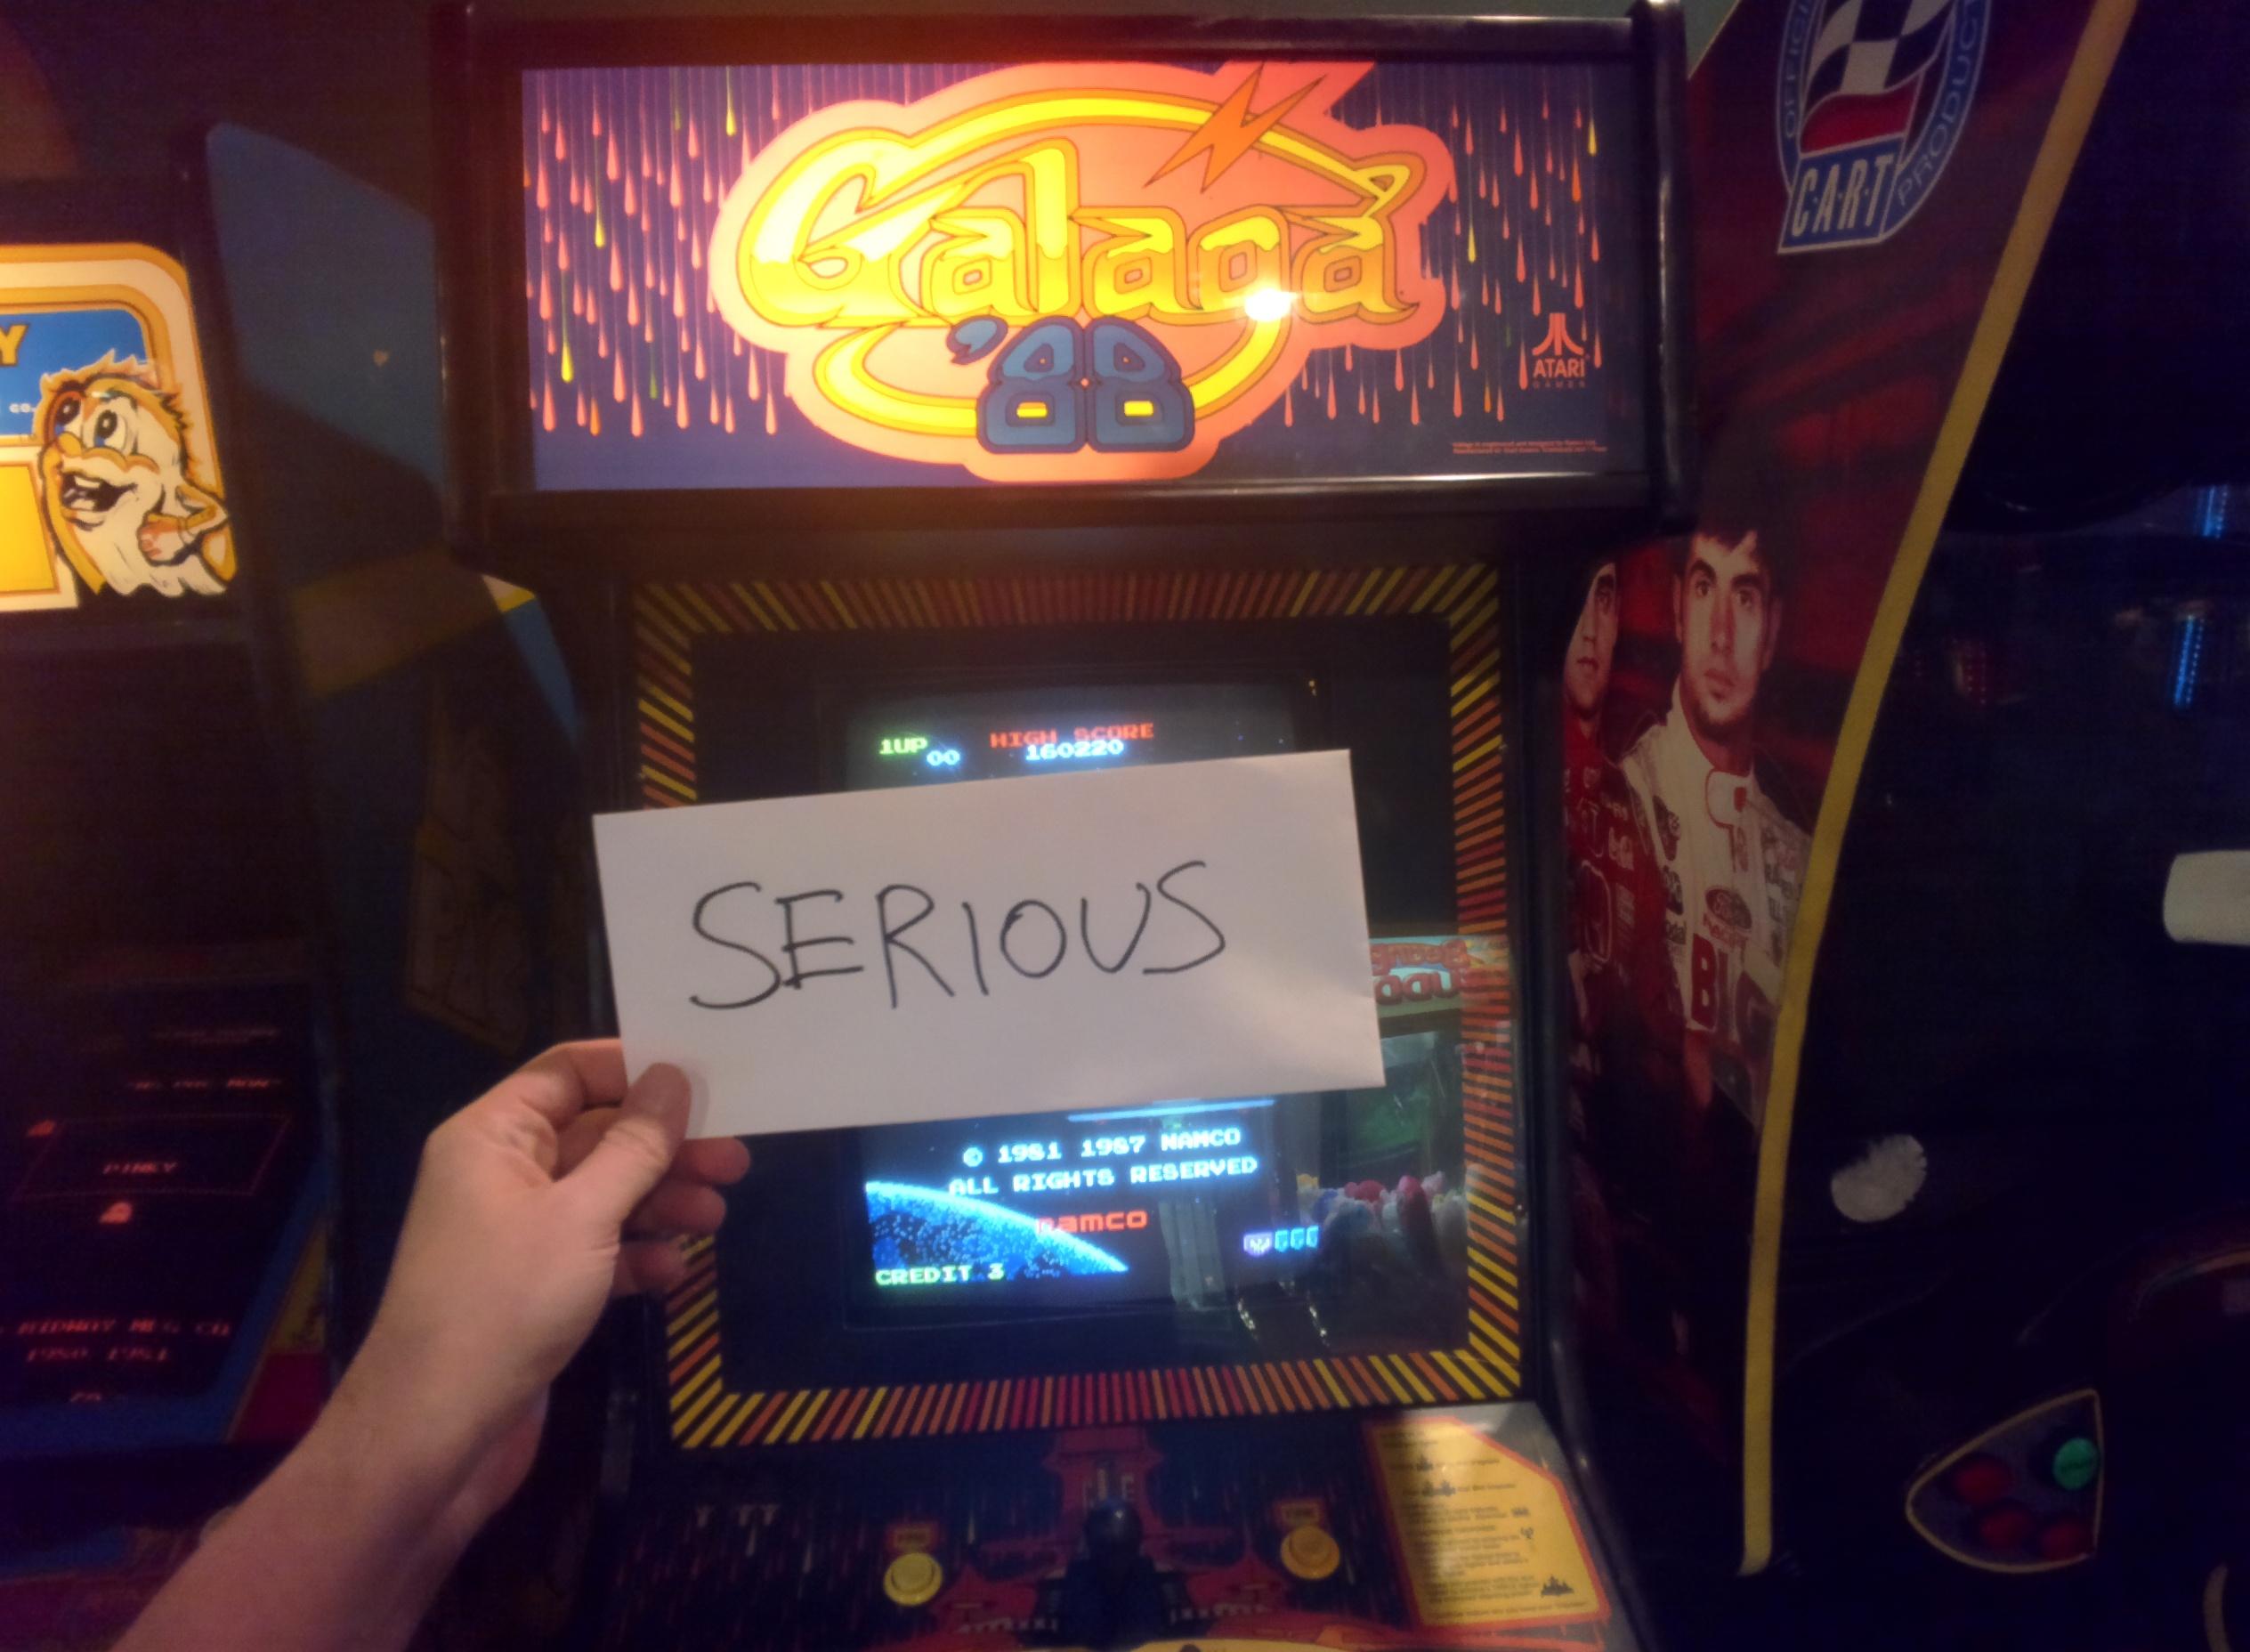 Serious: Galaga 88 (Arcade) 160,220 points on 2014-06-27 08:52:54